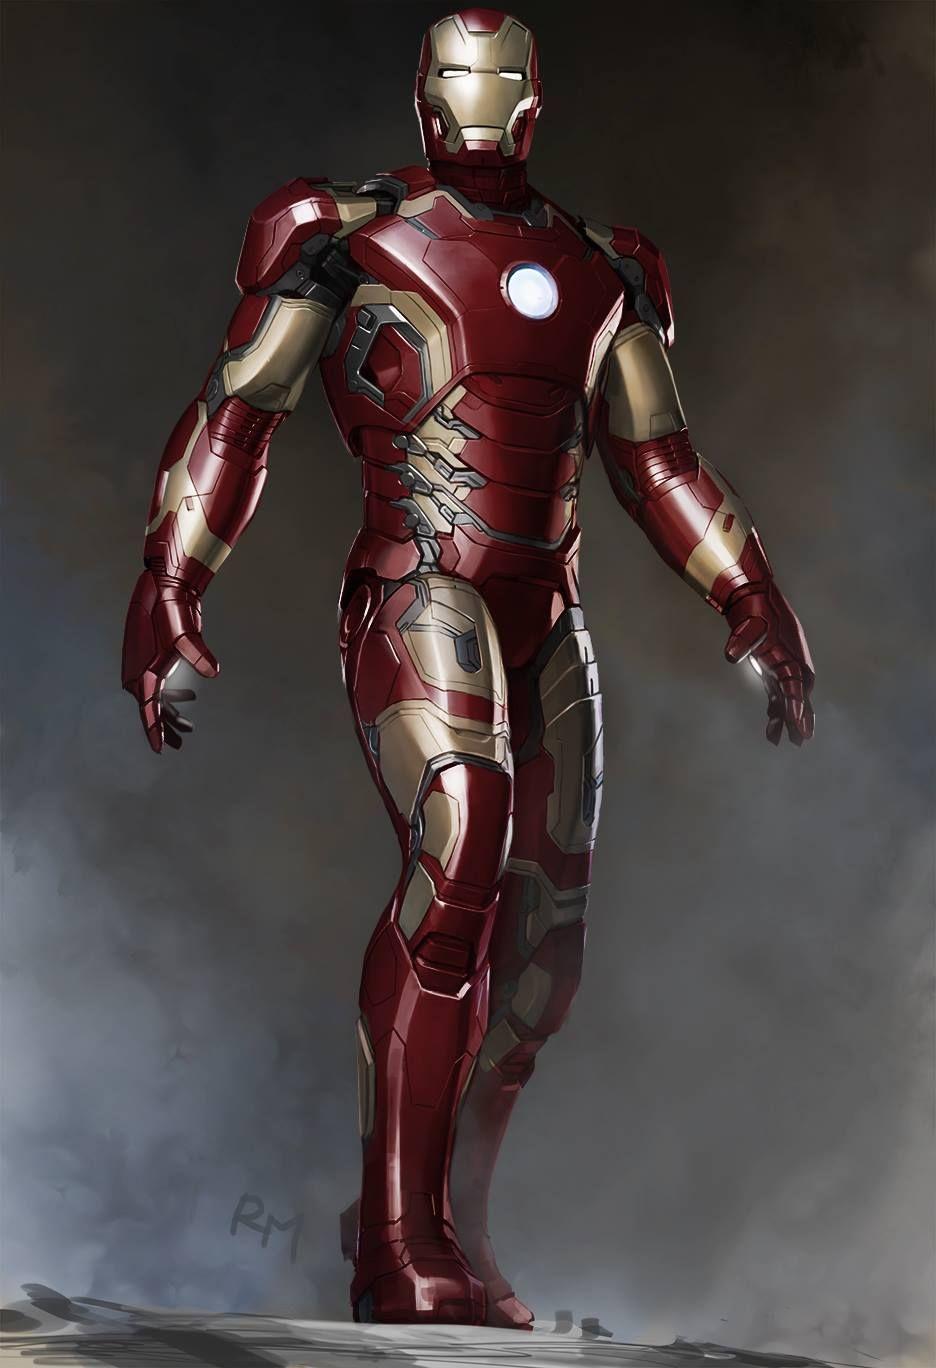 Iron man iron man pinterest avengers age concept for Plan d iron man